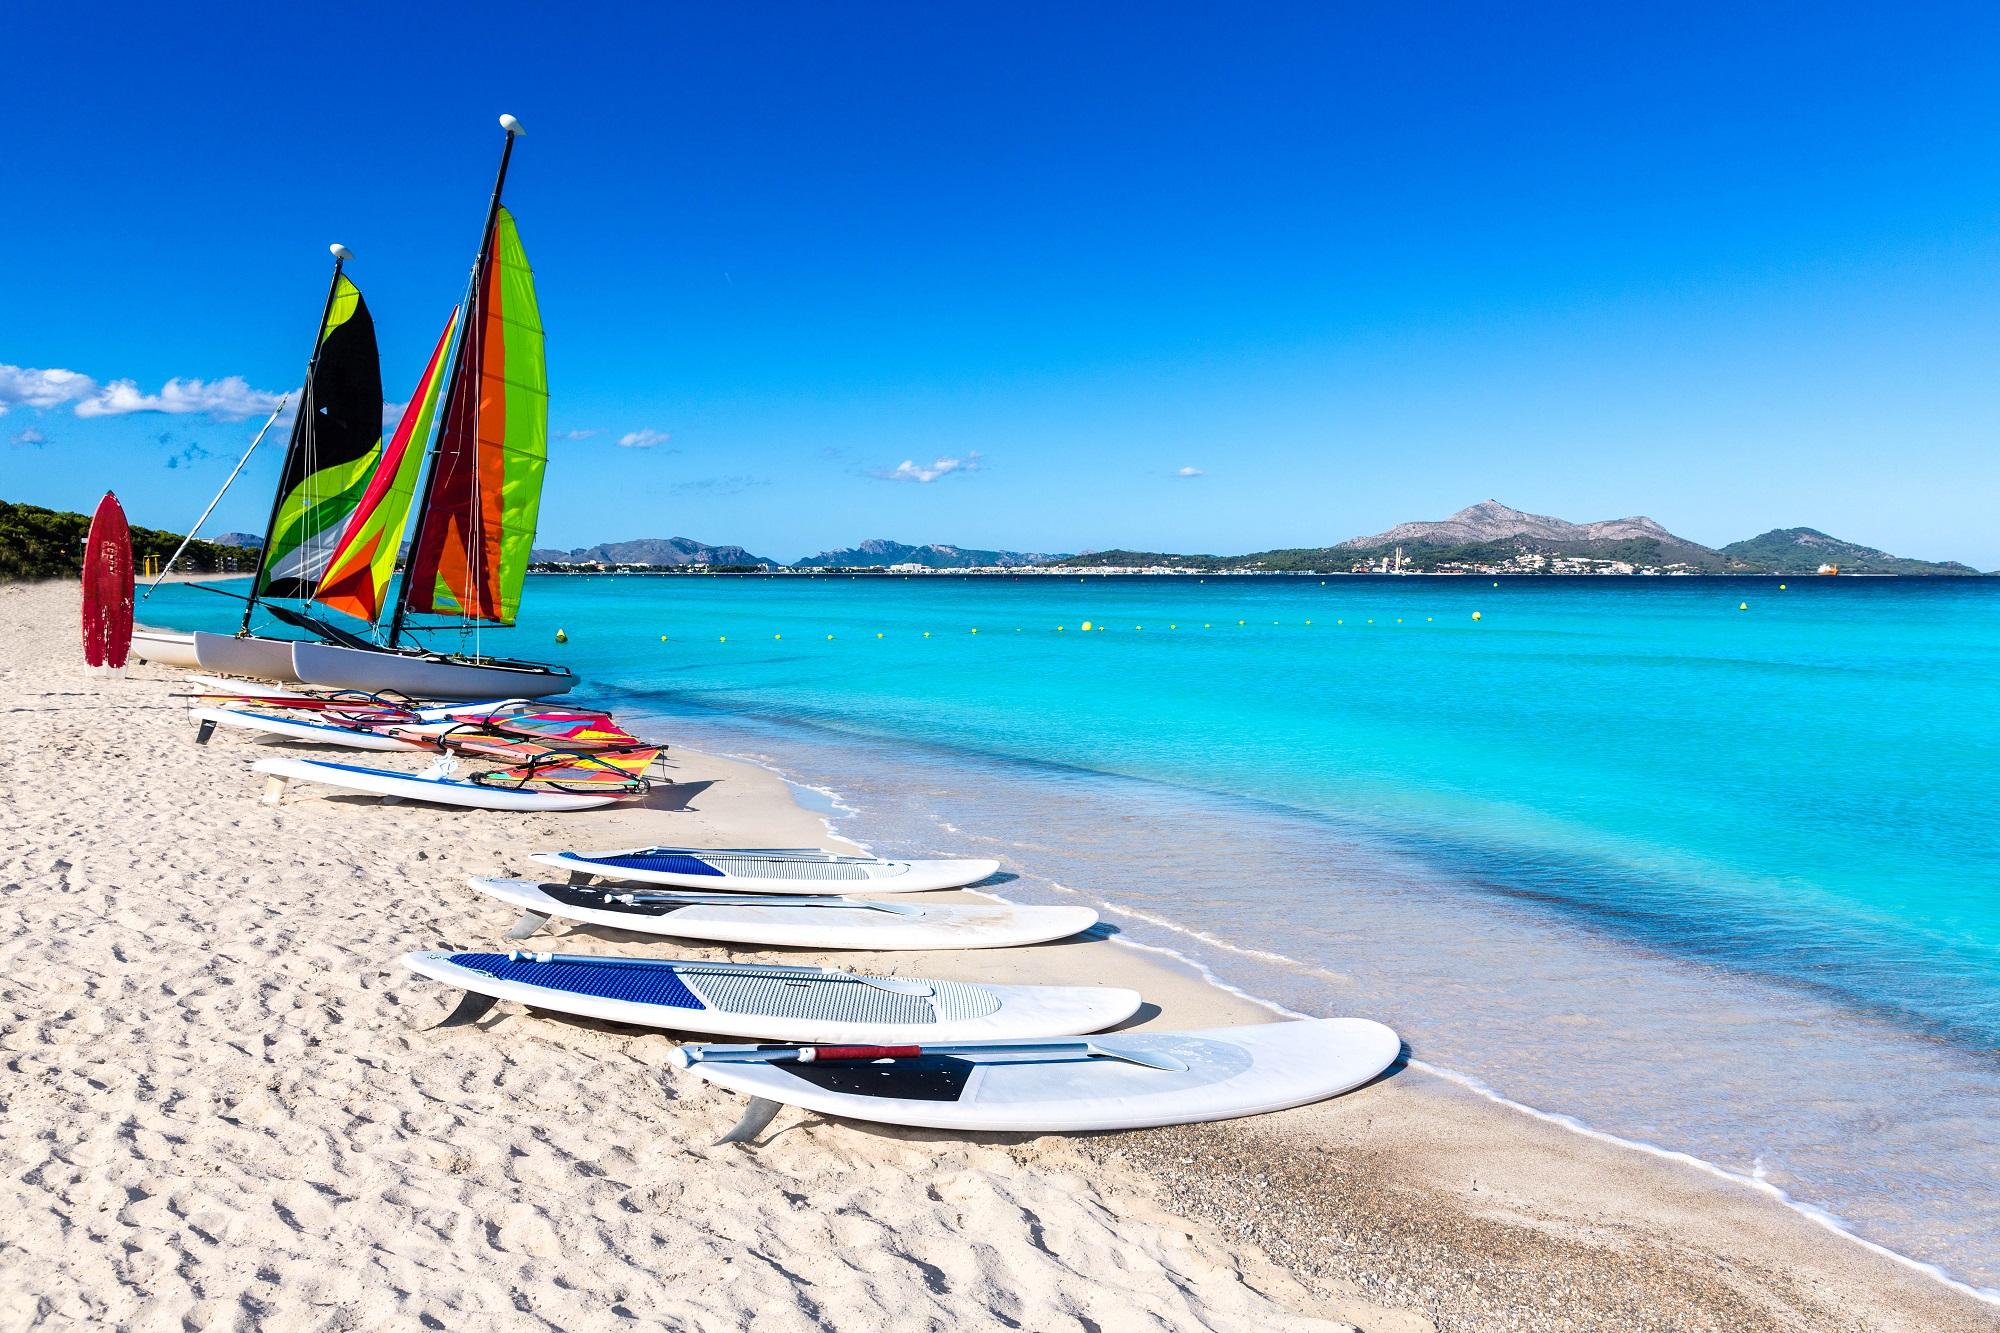 Playa de Muro Plaj'nda sörf yapın